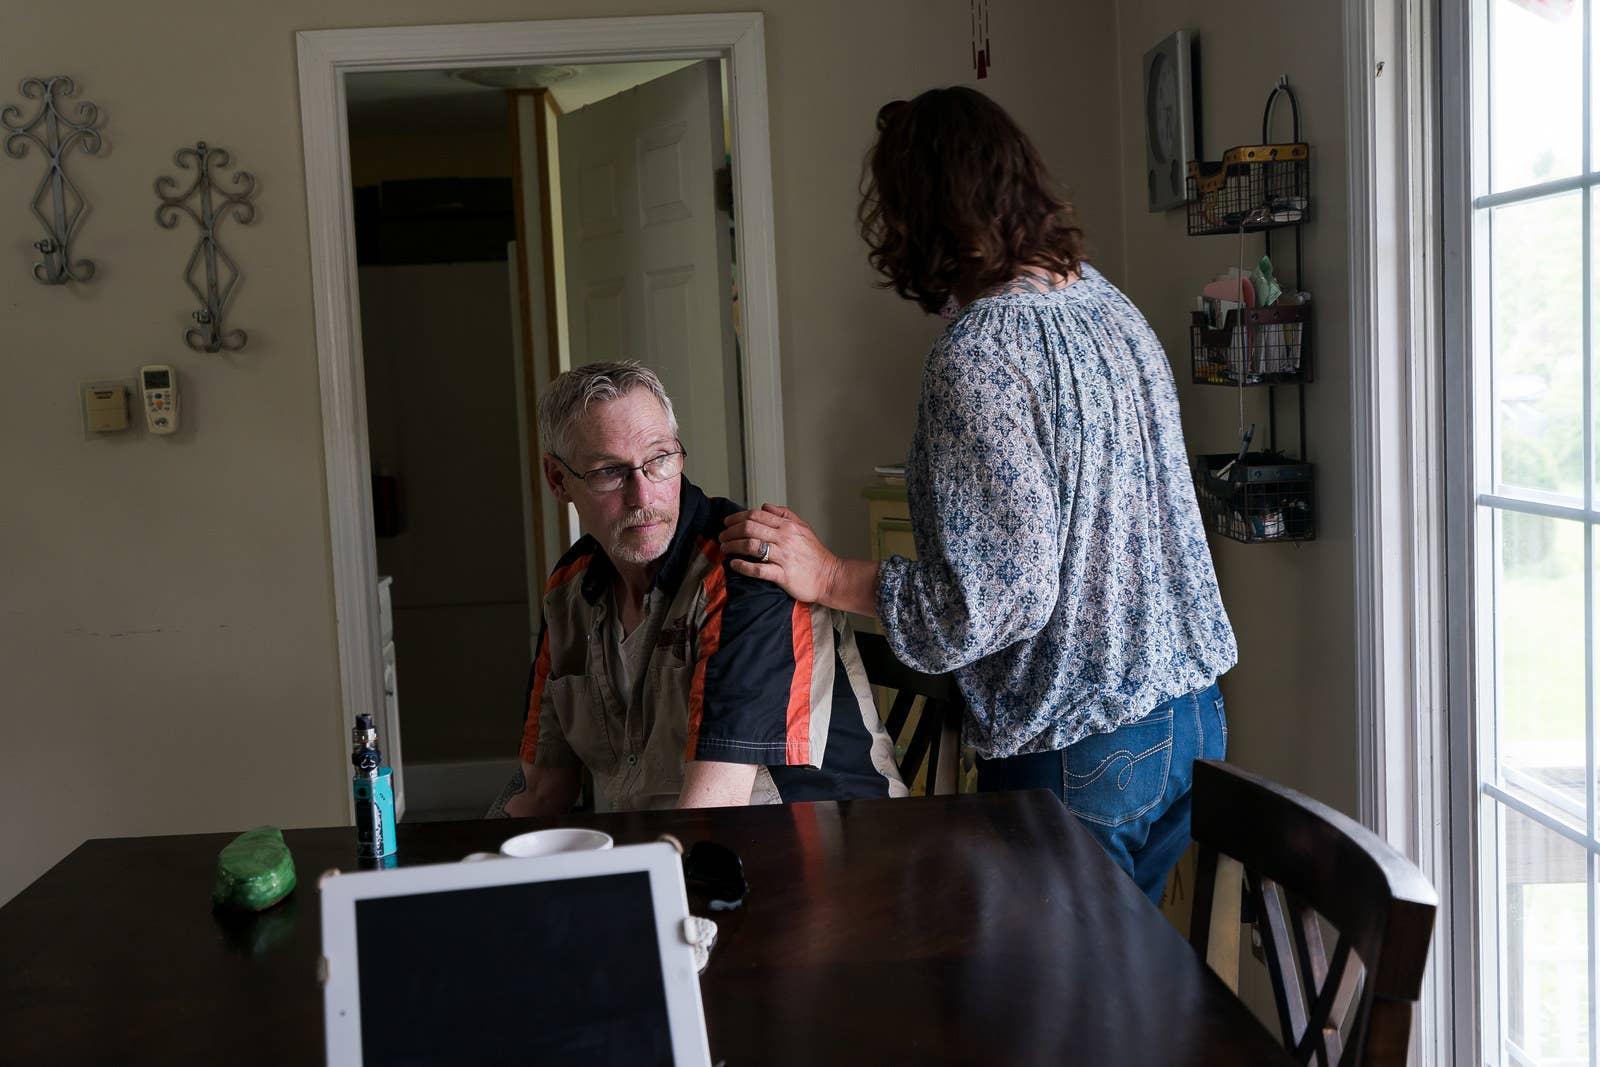 True and her husband, John Wolstenhulme, at their home in Maine.